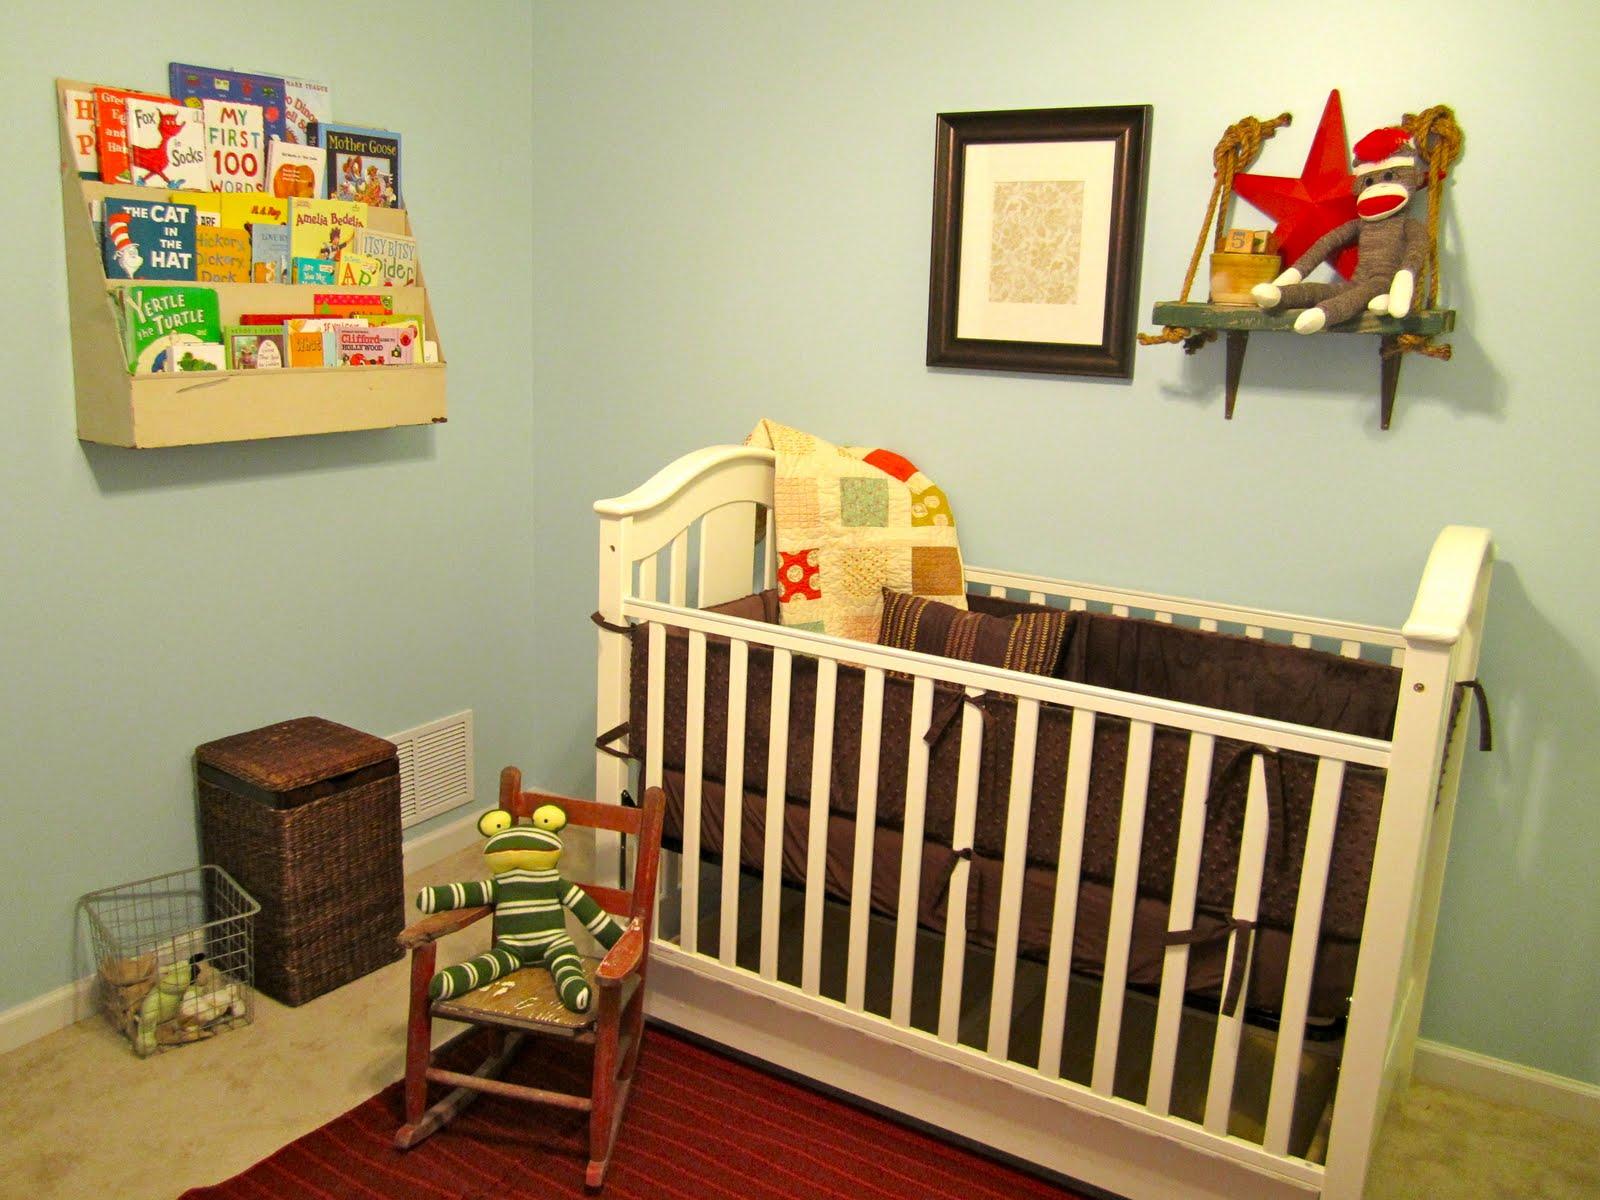 Baby room ideas on a budget - Baby Nursery On A Budget